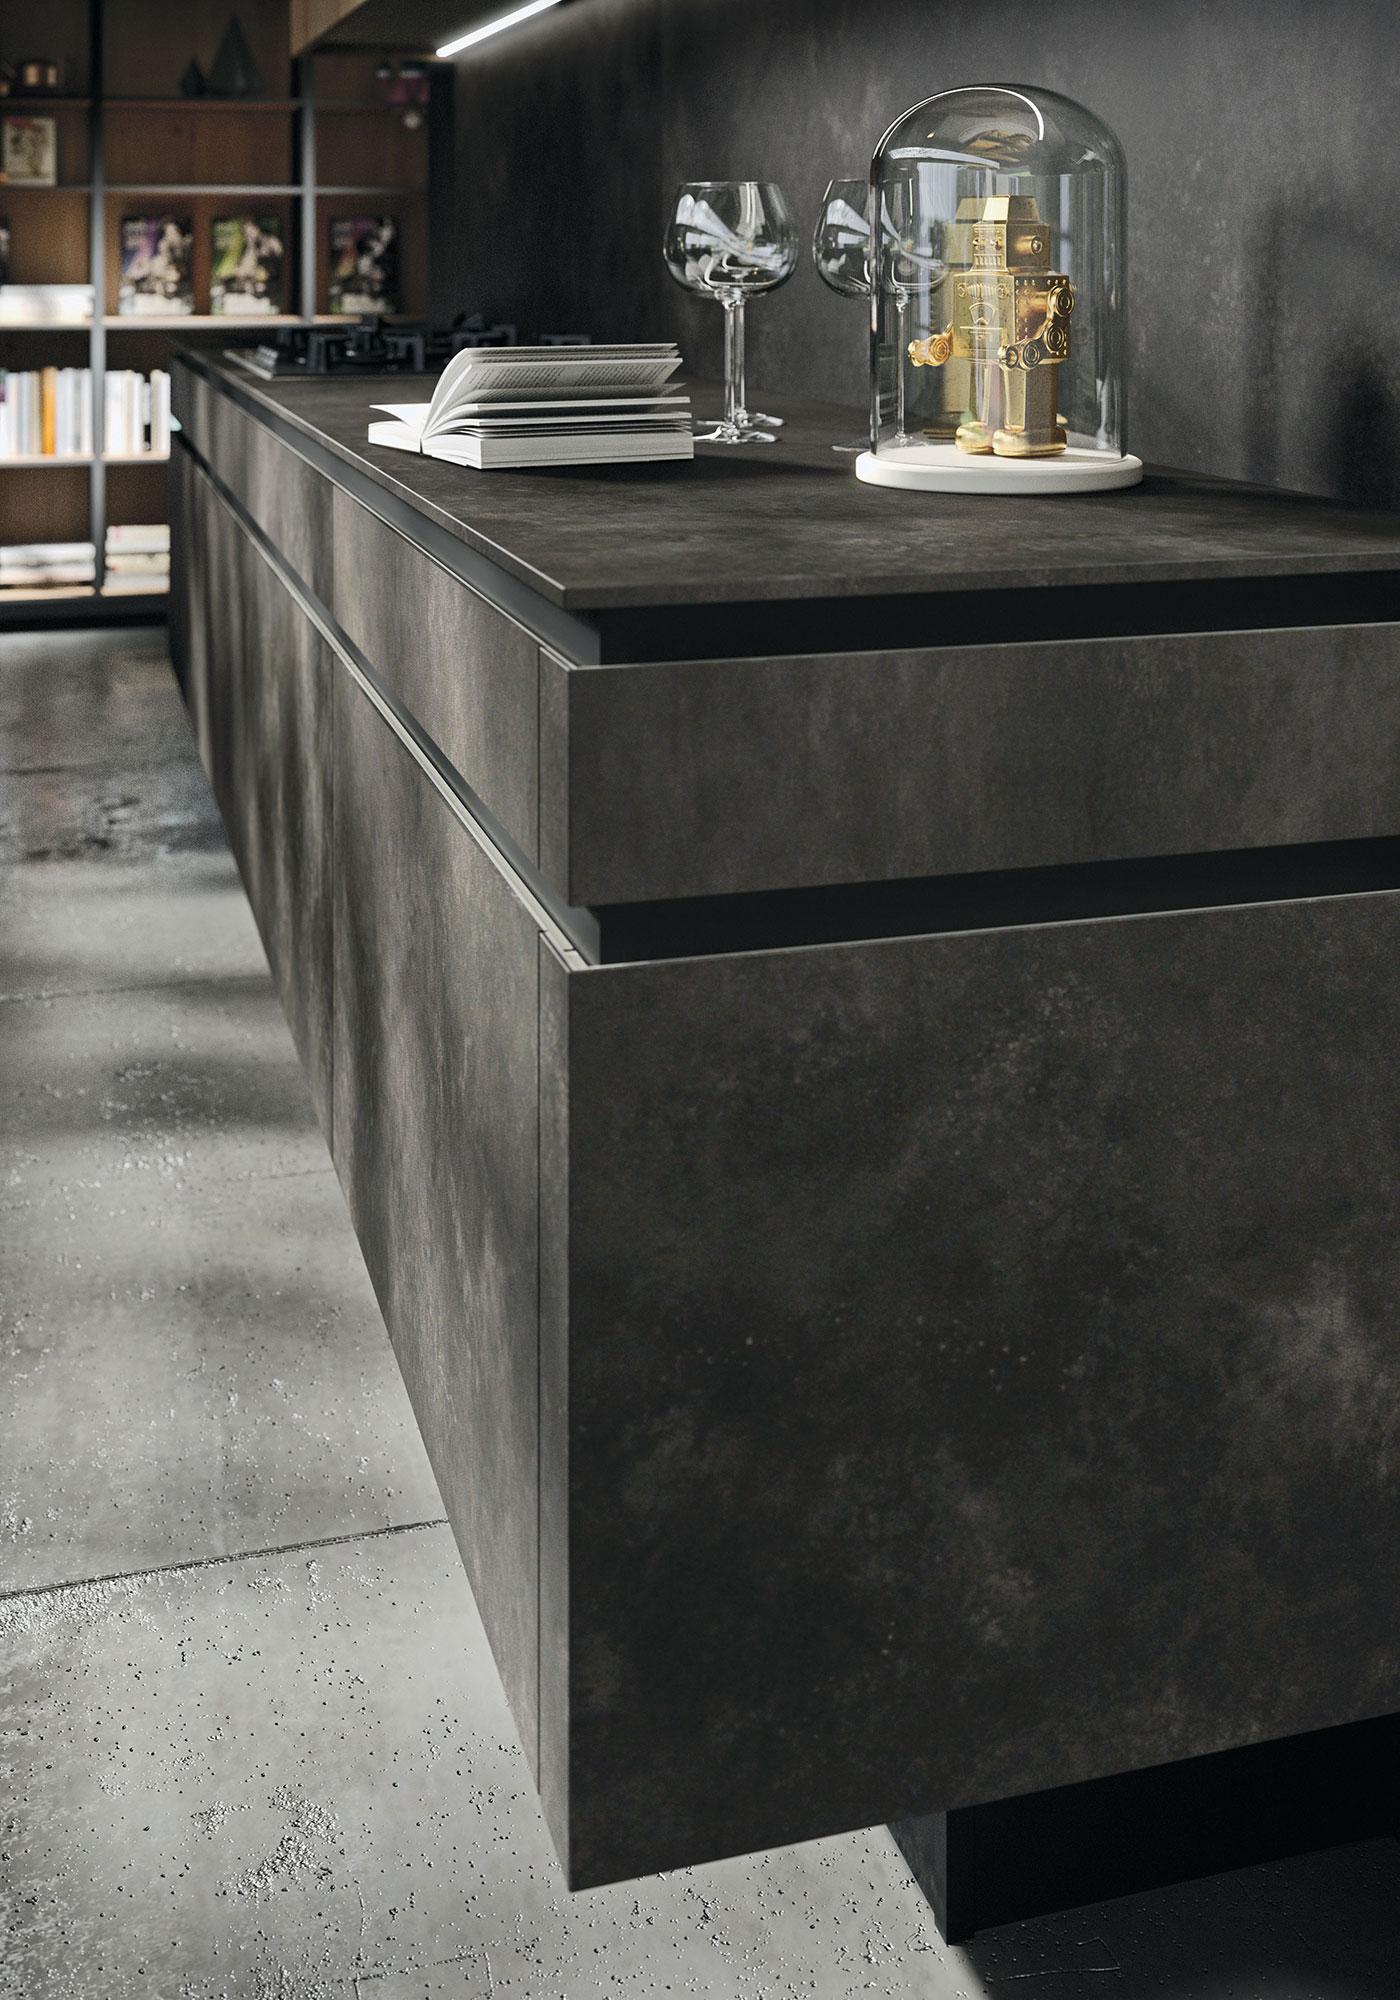 Italiaanse designkeuken Snaidero Way Materia. Moderne greeploze keuken in donkere kleur #design #designkeuken #snaidero #madeinitaly #keuken